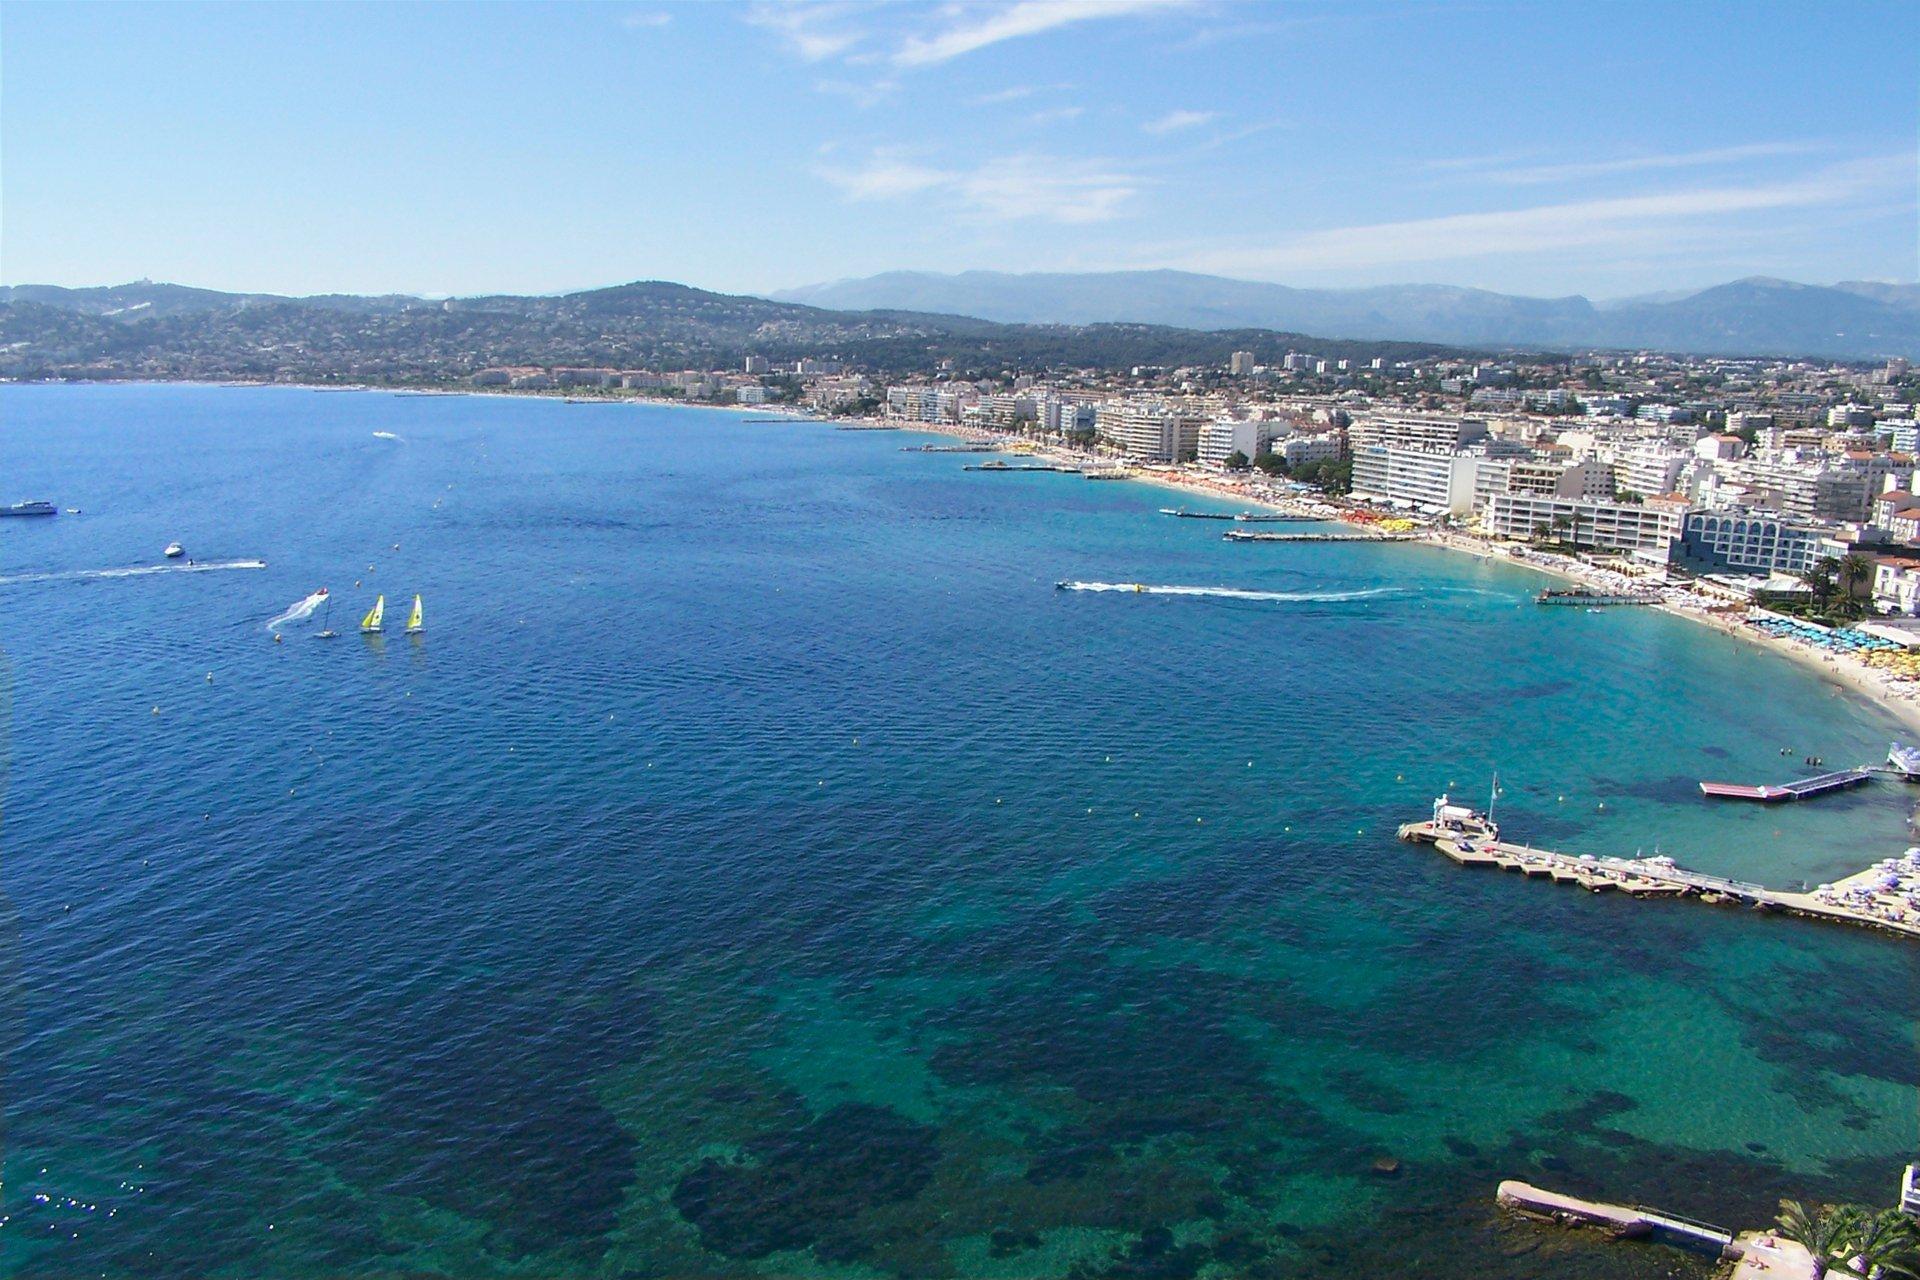 JUAN LES PINS - French Riviera - 2 bed apartment near beaches